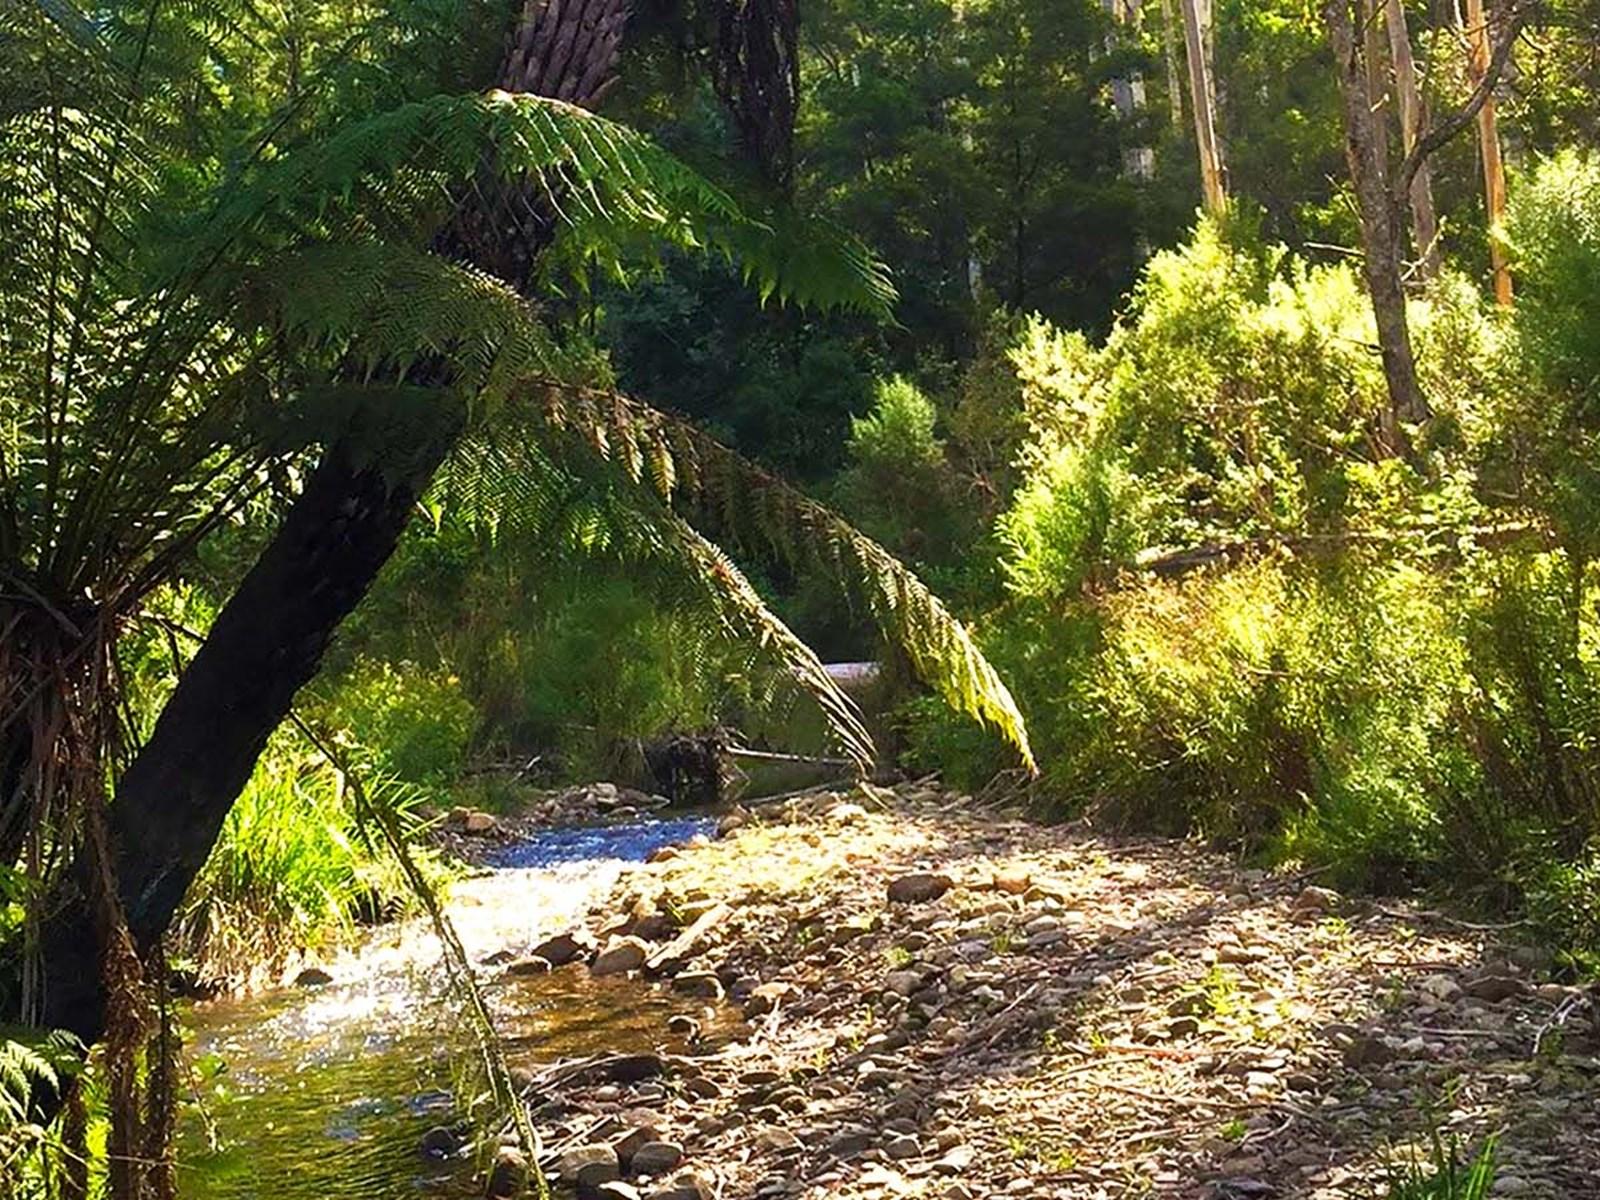 Errinundra National Park, Gippsland, Victoria, Australia